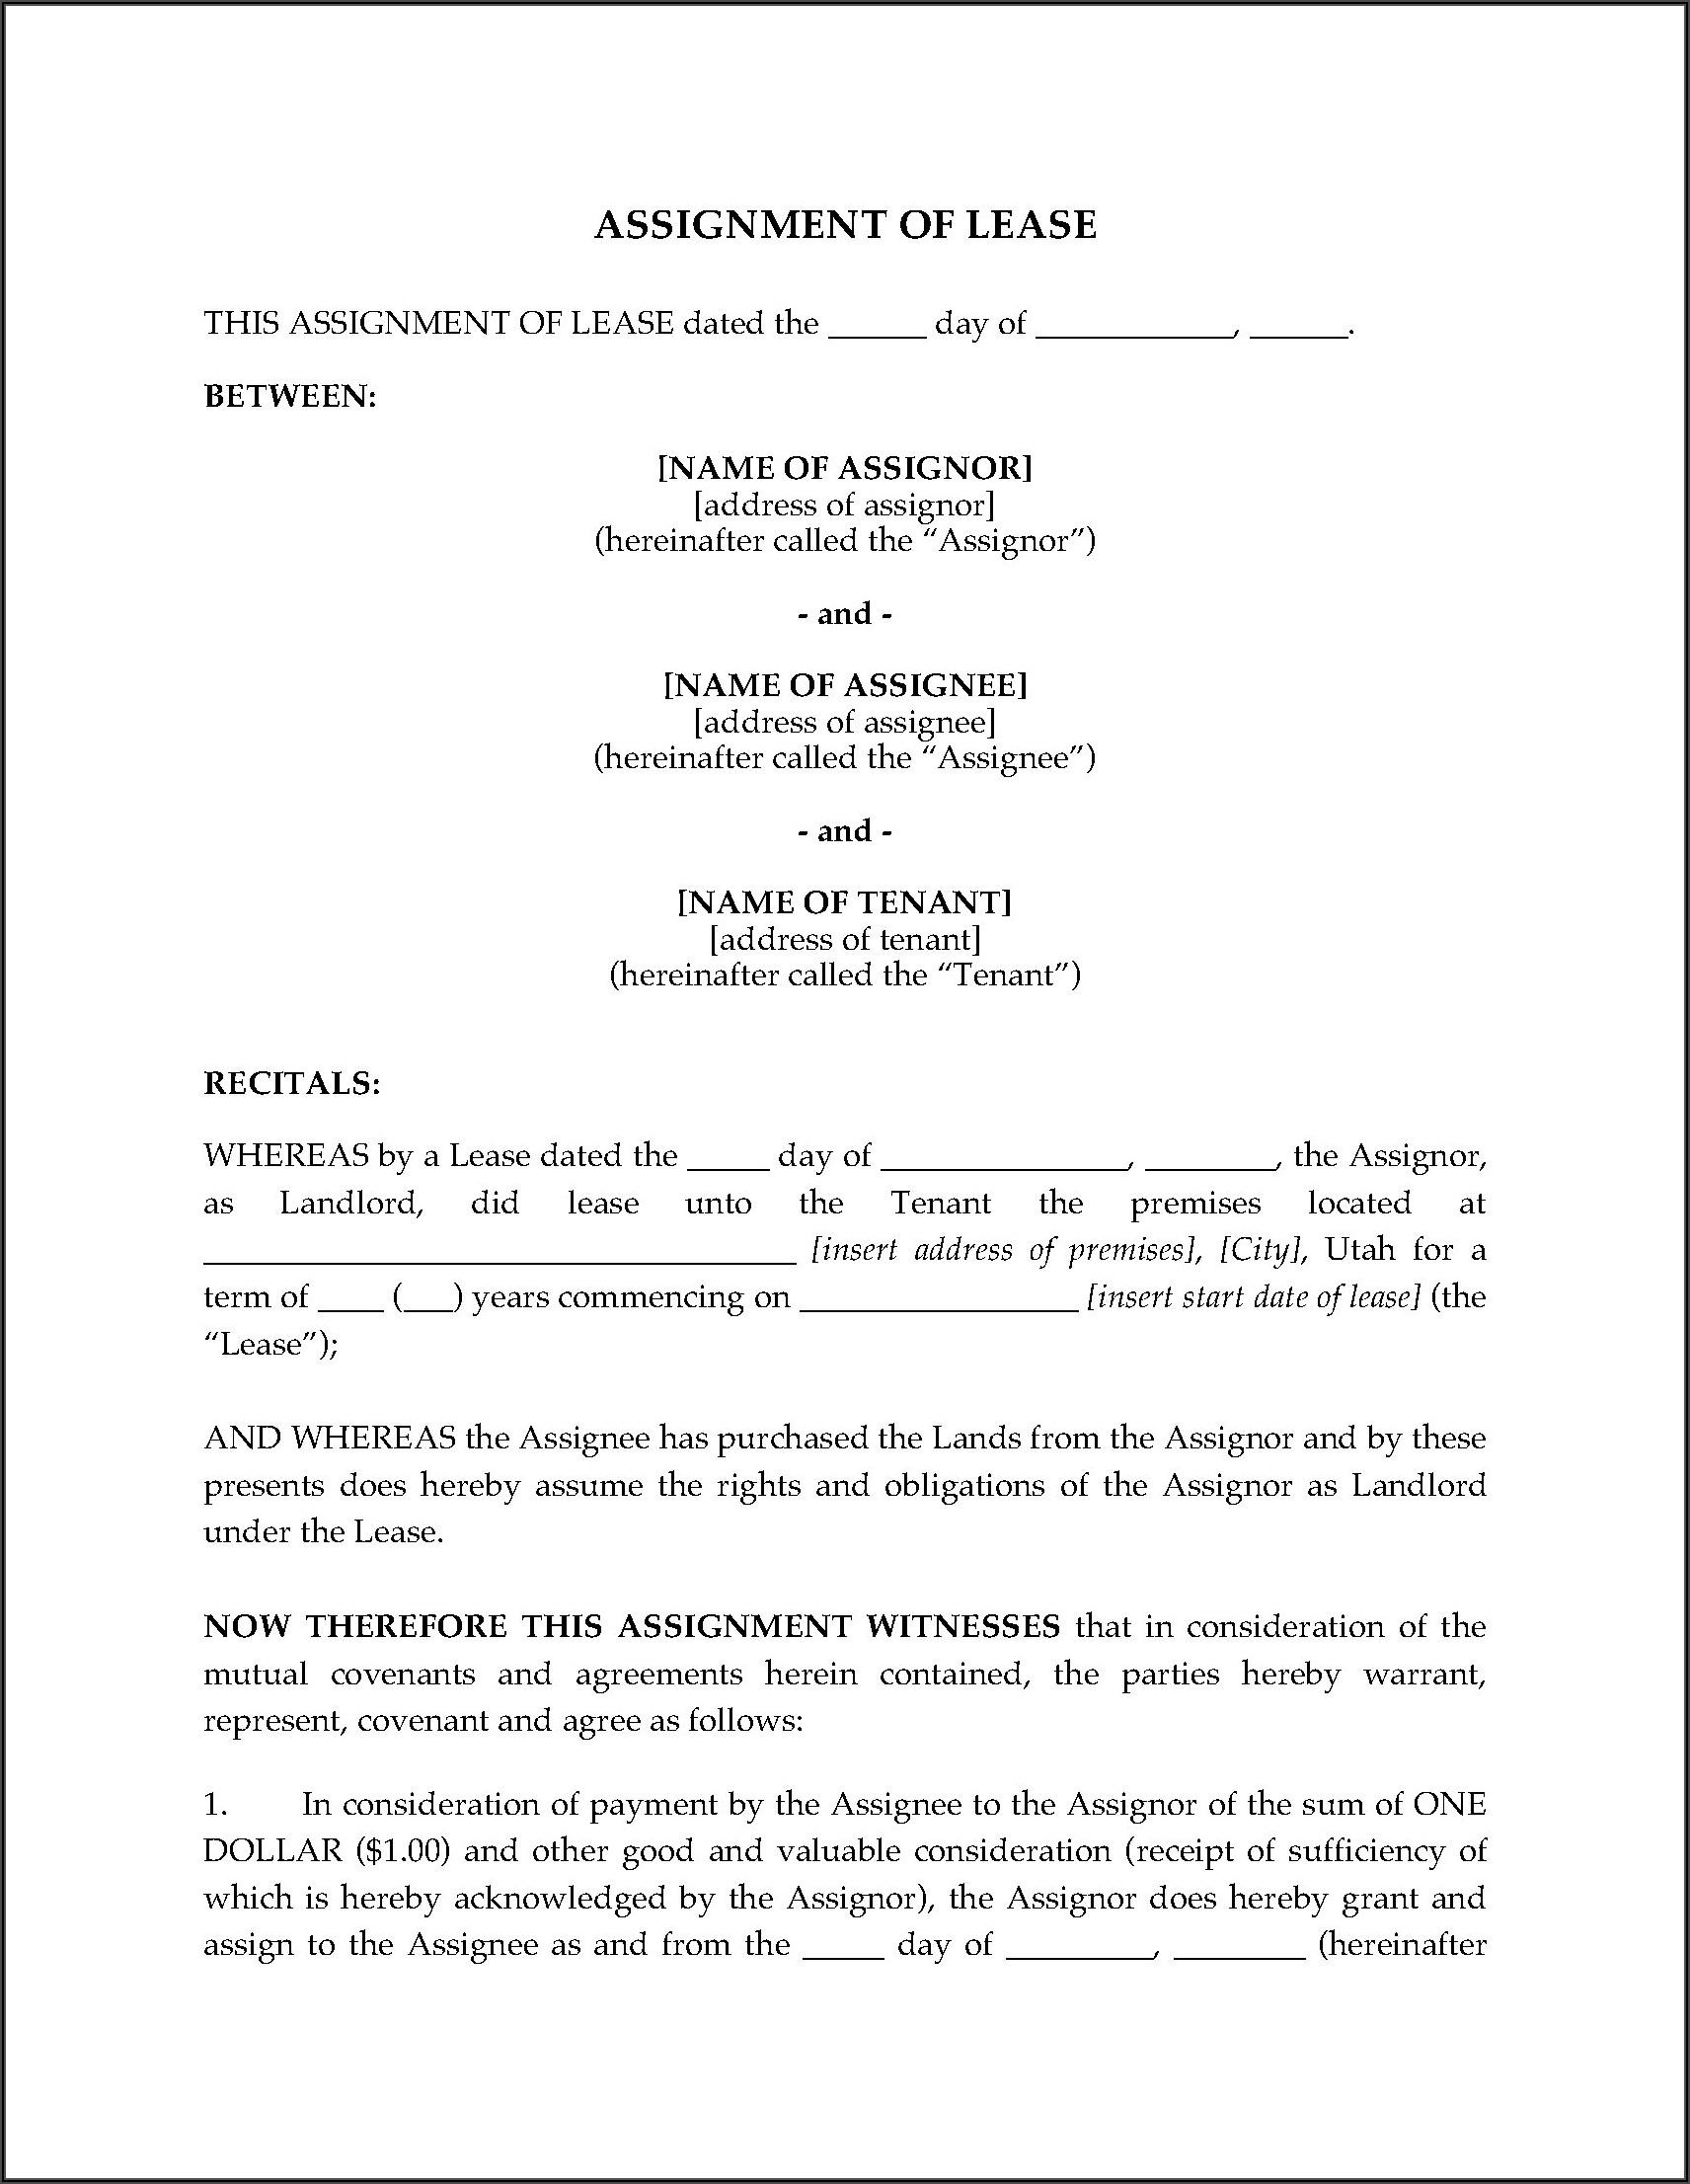 Utah Landlord Forms